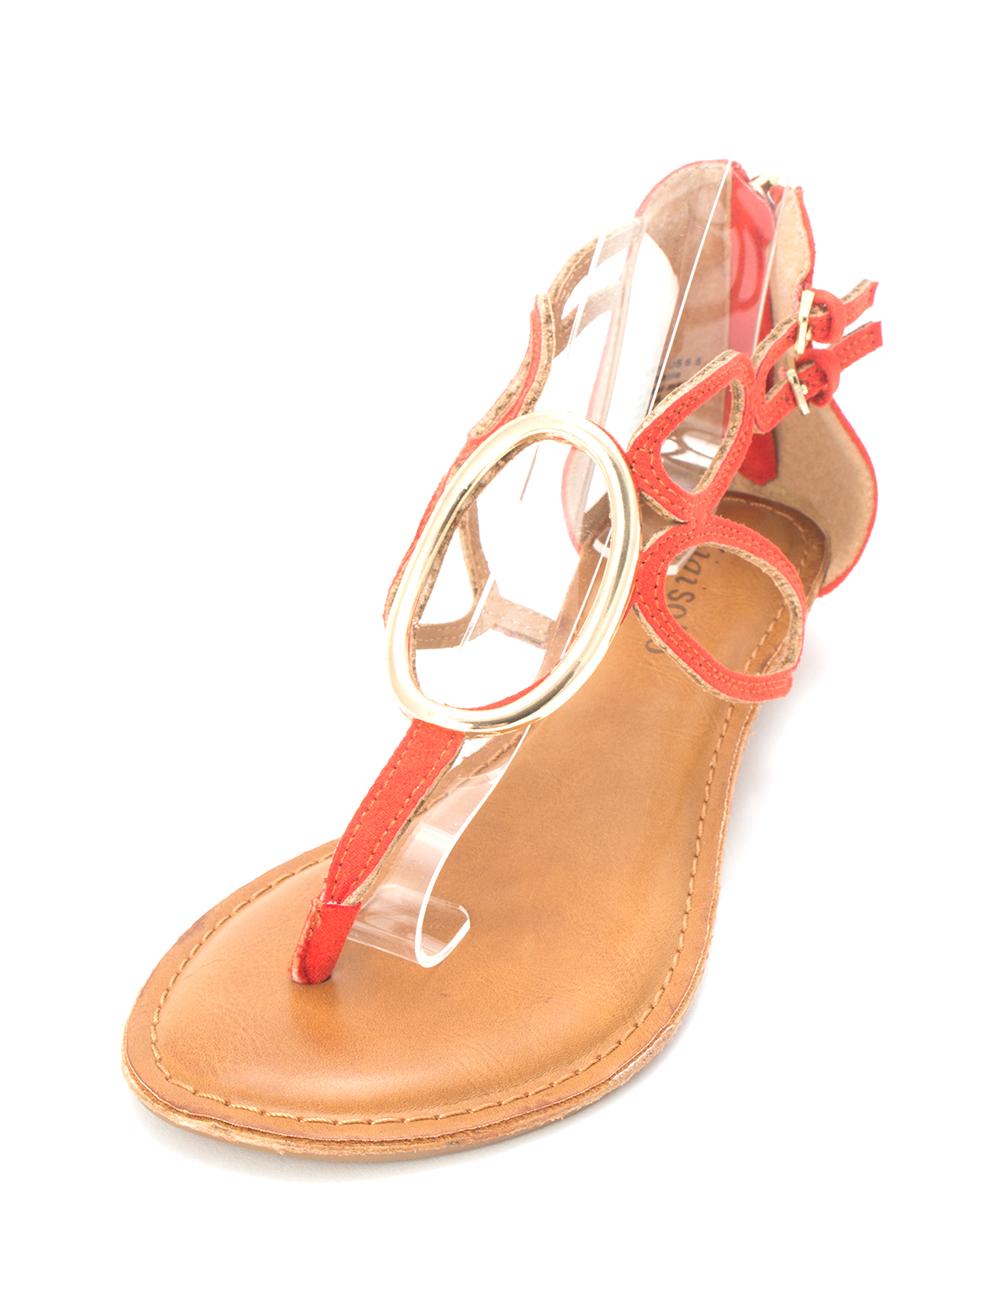 80aa49a21b5 ZIGI SOHO Womens Markah Open Toe Casual Strappy Sandals